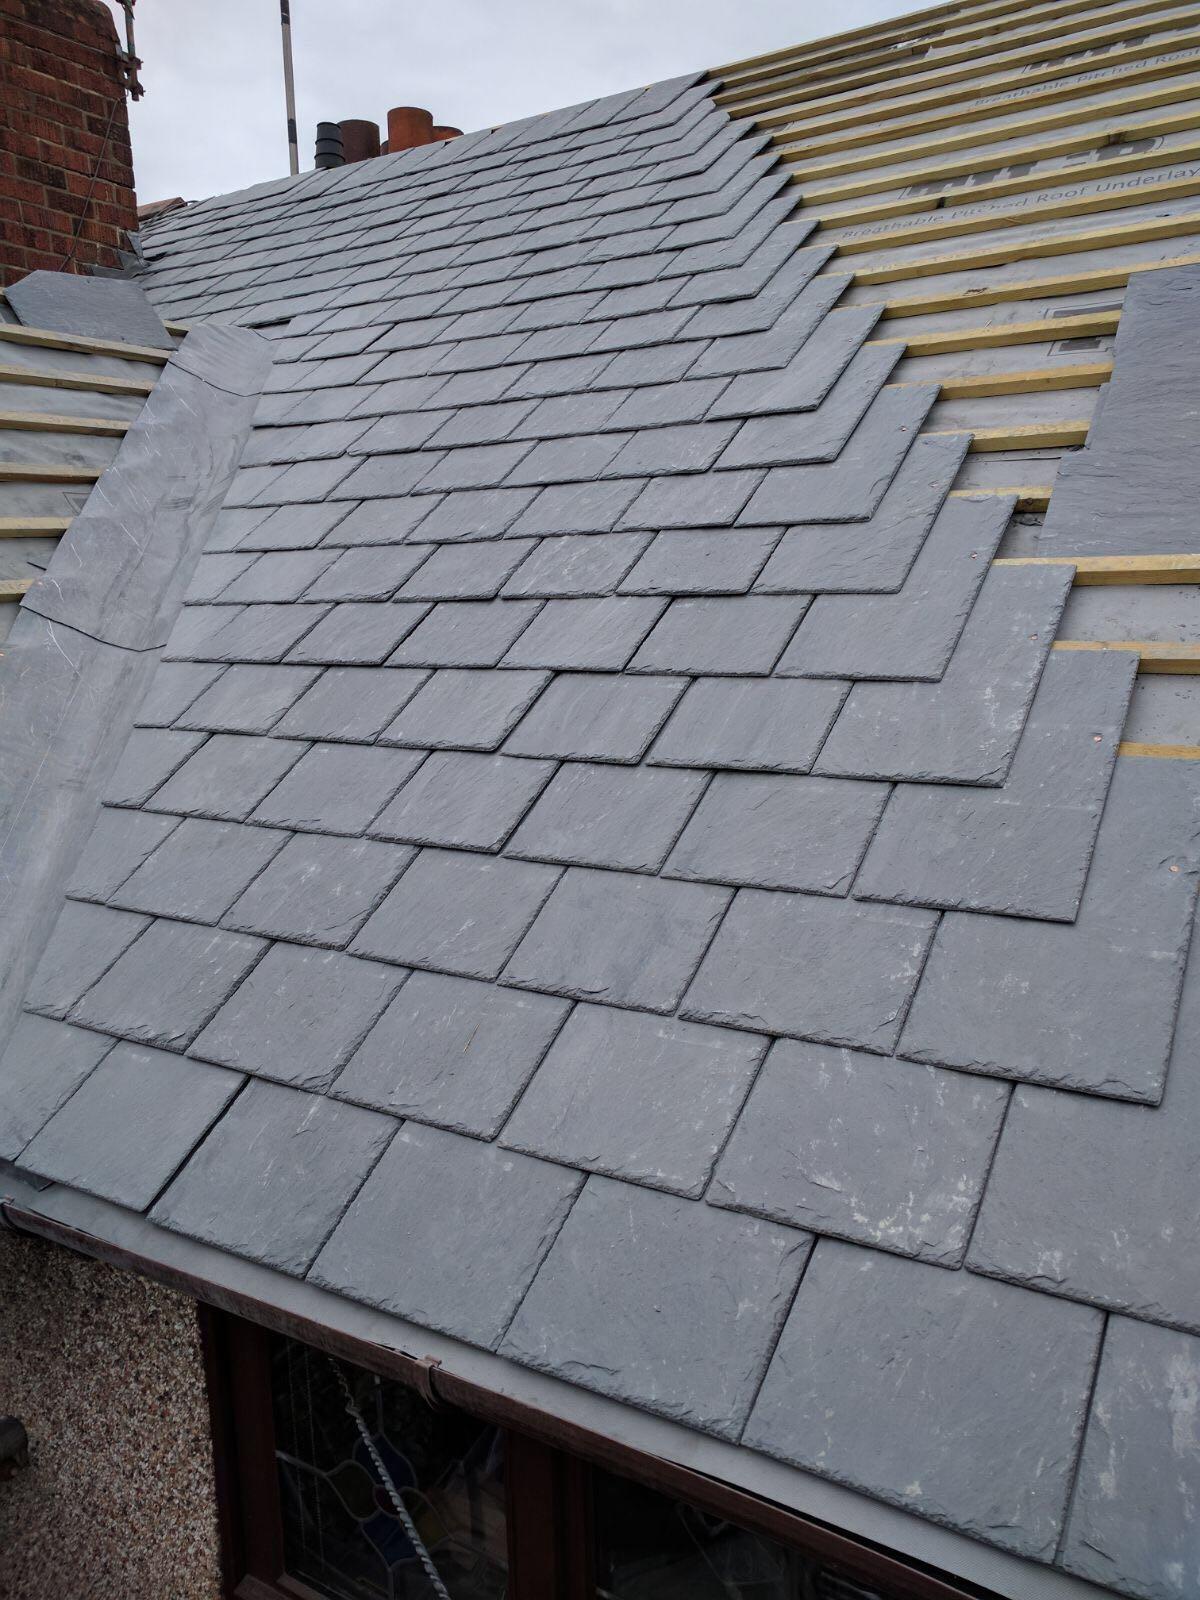 Main photo for Birmingham Roofing Ltd